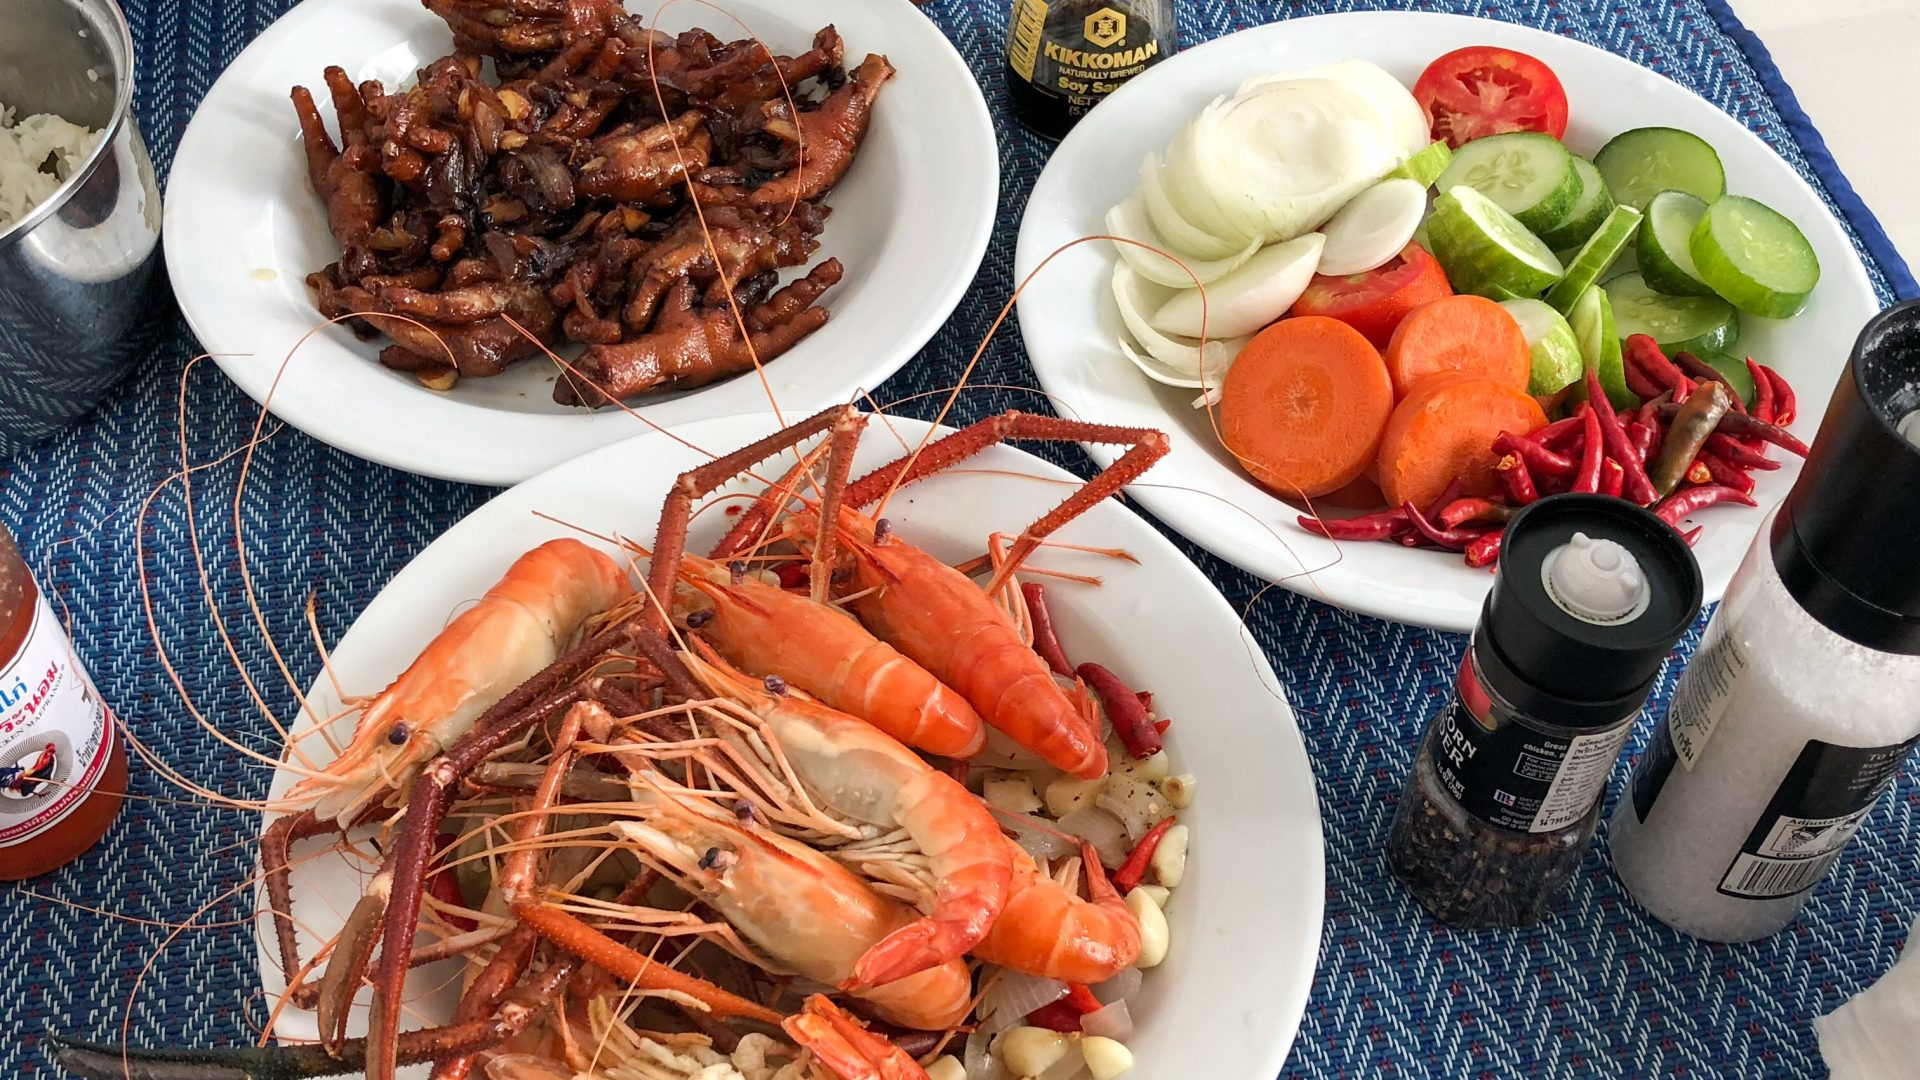 Chicken Feet Stir Fry and Shrimp Boil